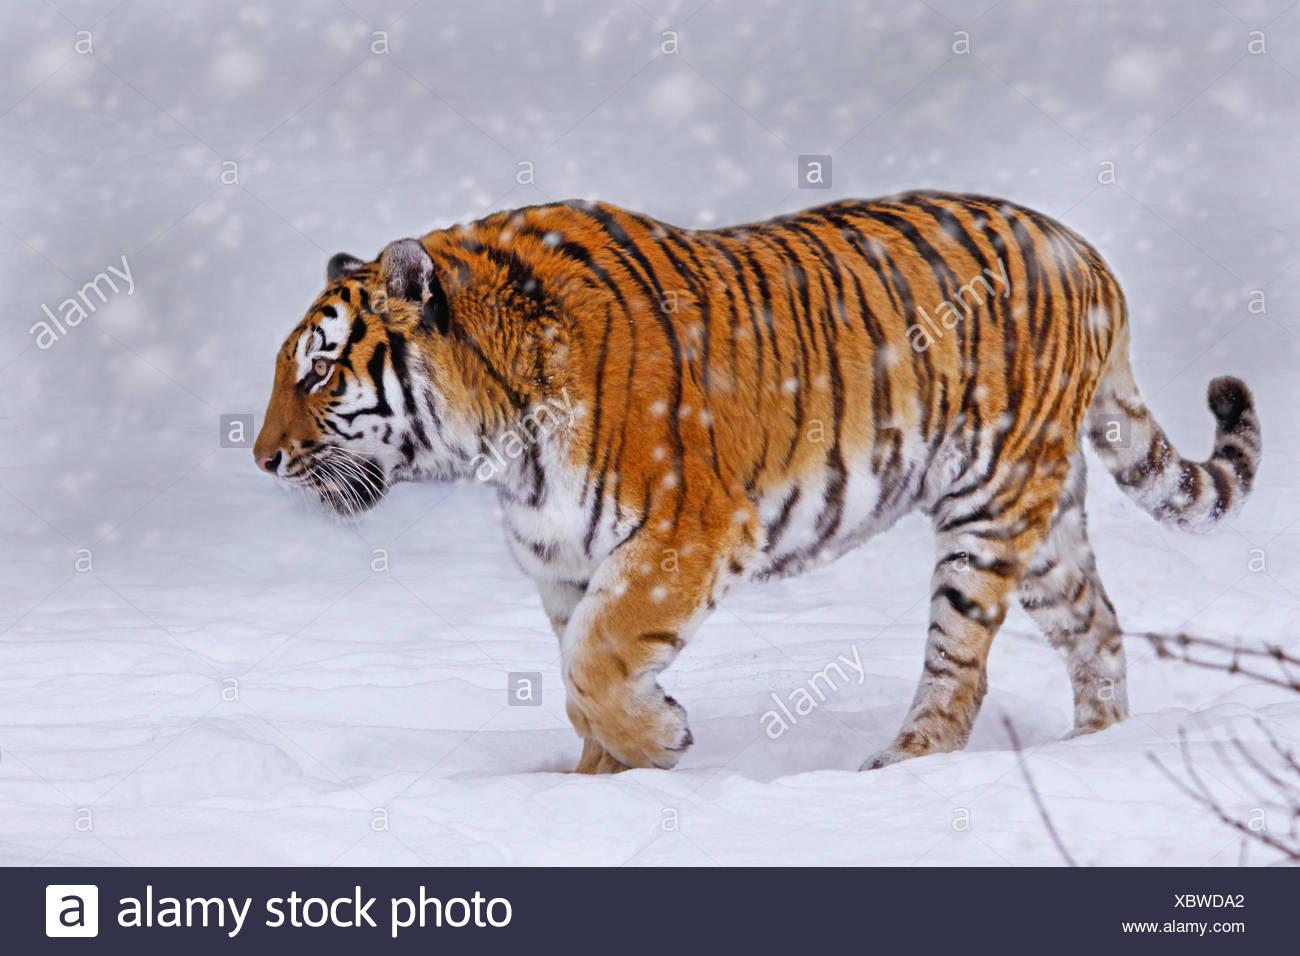 Tigre siberiano, Amurian tigre (Panthera tigris altaica), paseos a través de la nieve Imagen De Stock